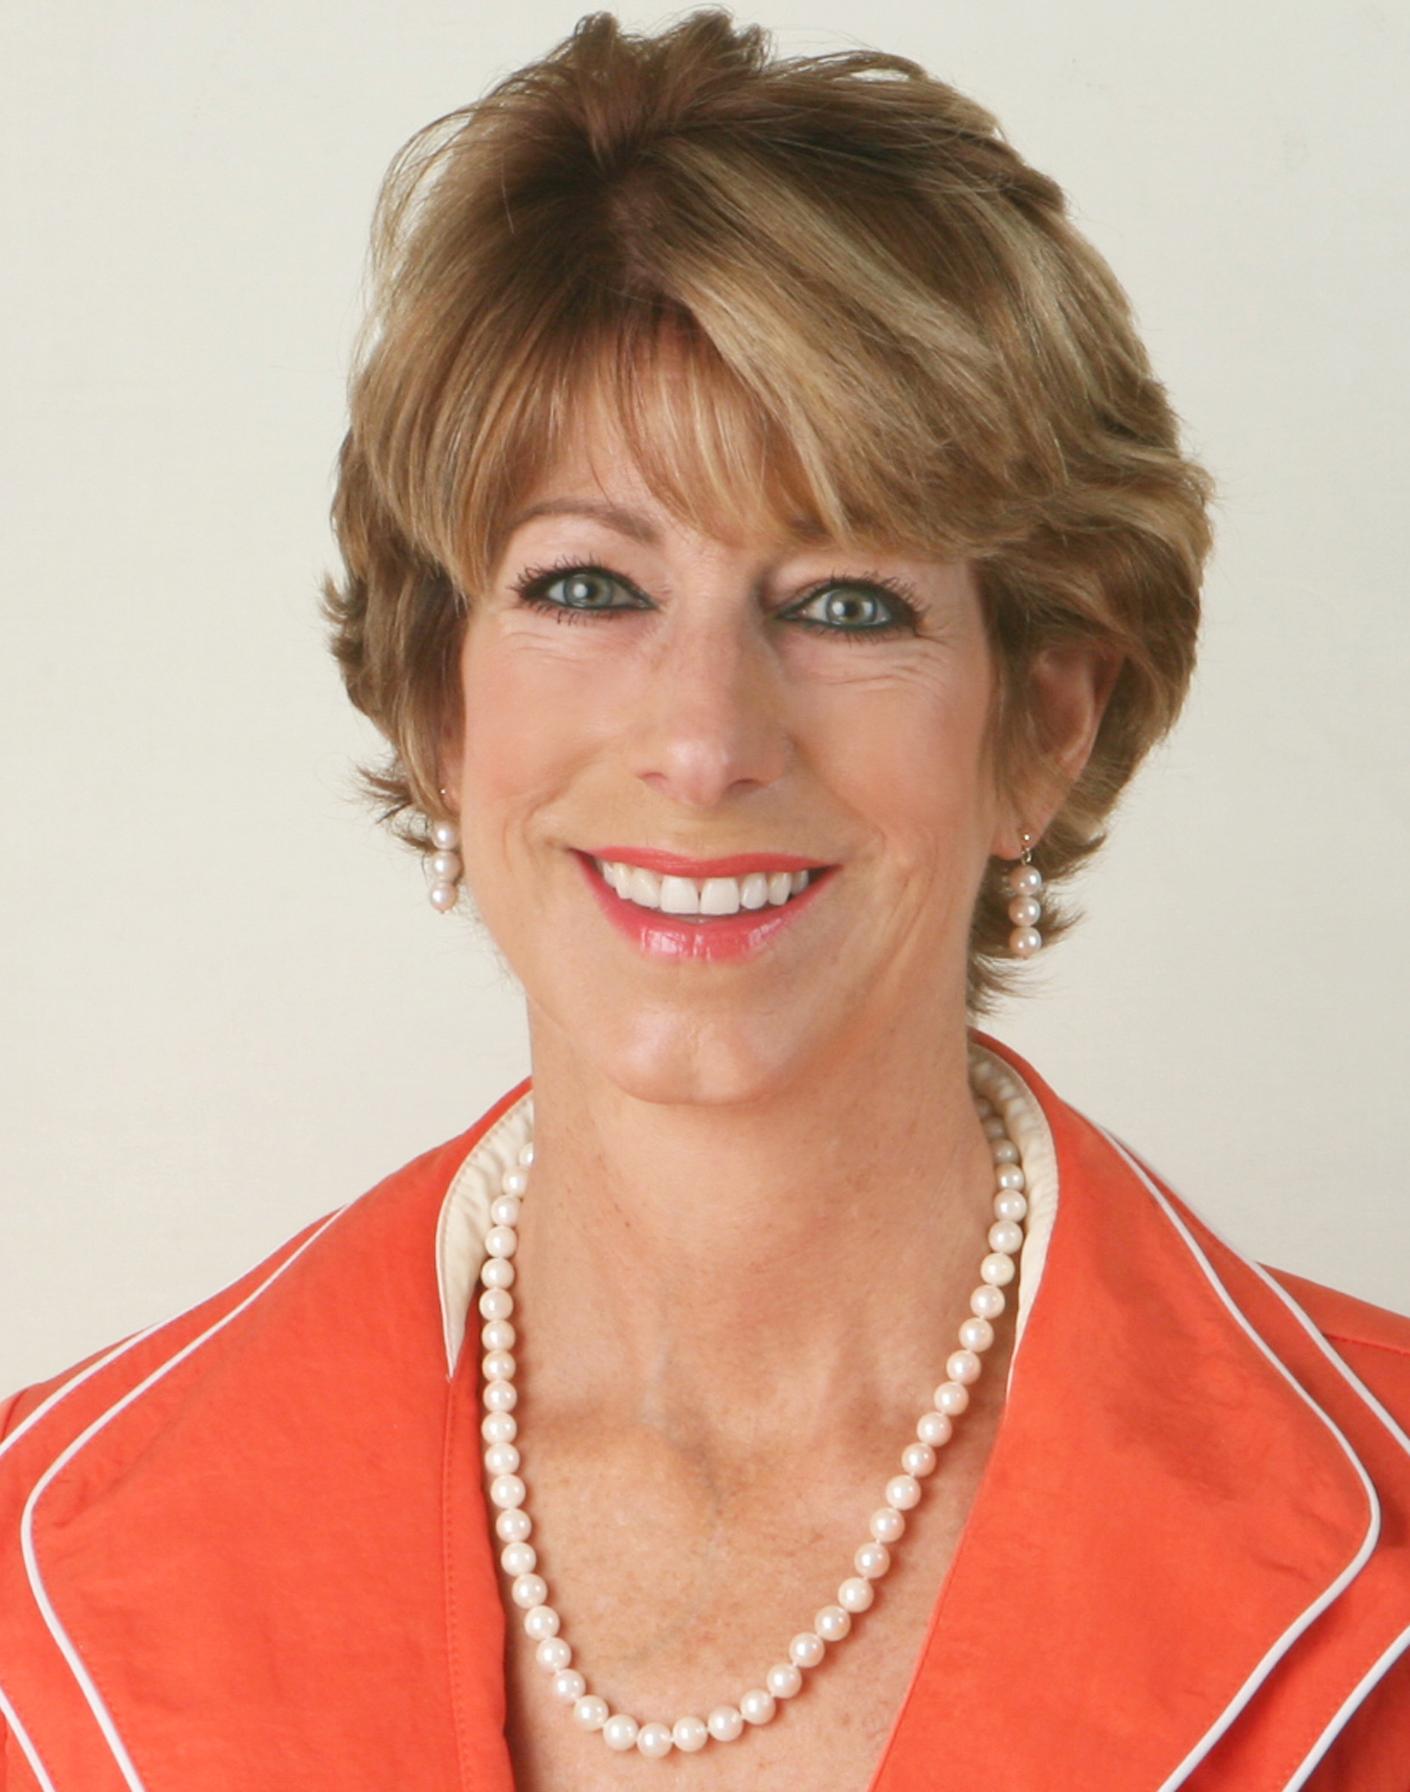 Kimberly Freiwald